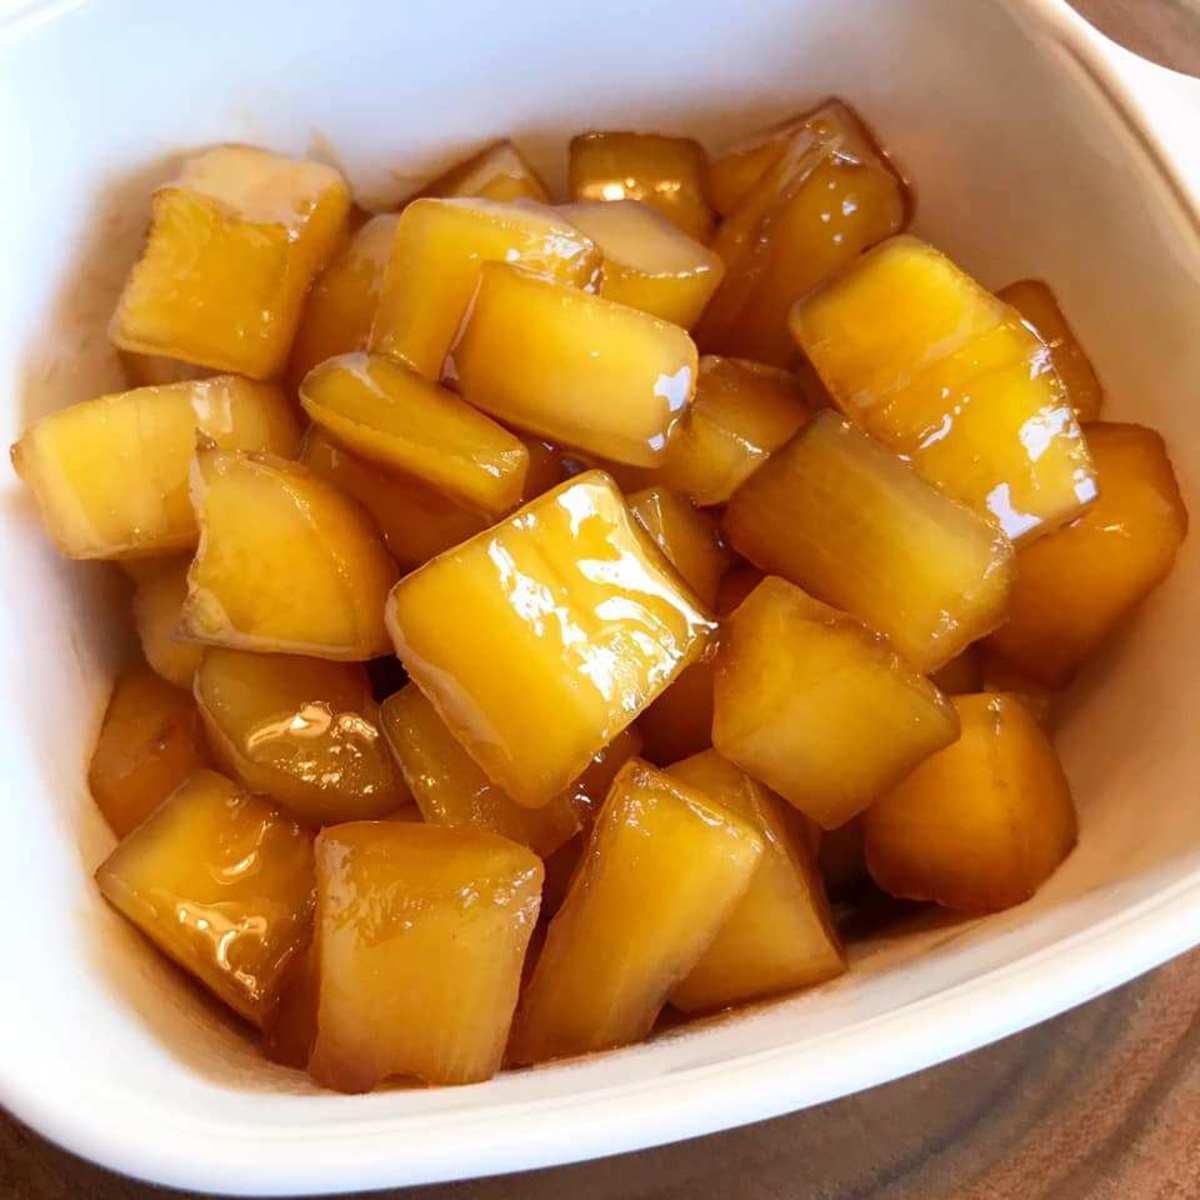 Matamis na kamote was my favorite childhood dessert